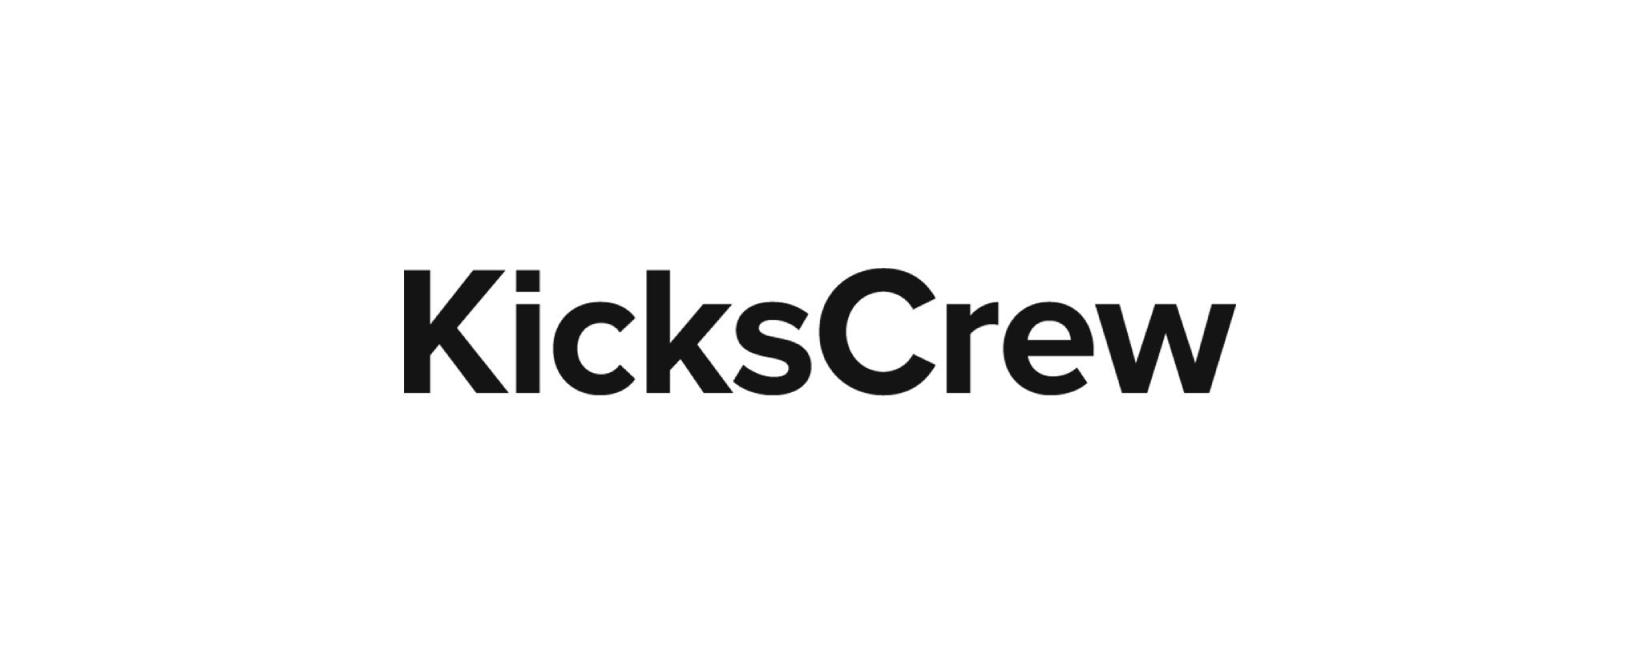 Kickscrew Reviews – Buy & Sell Your Designer Shoes!